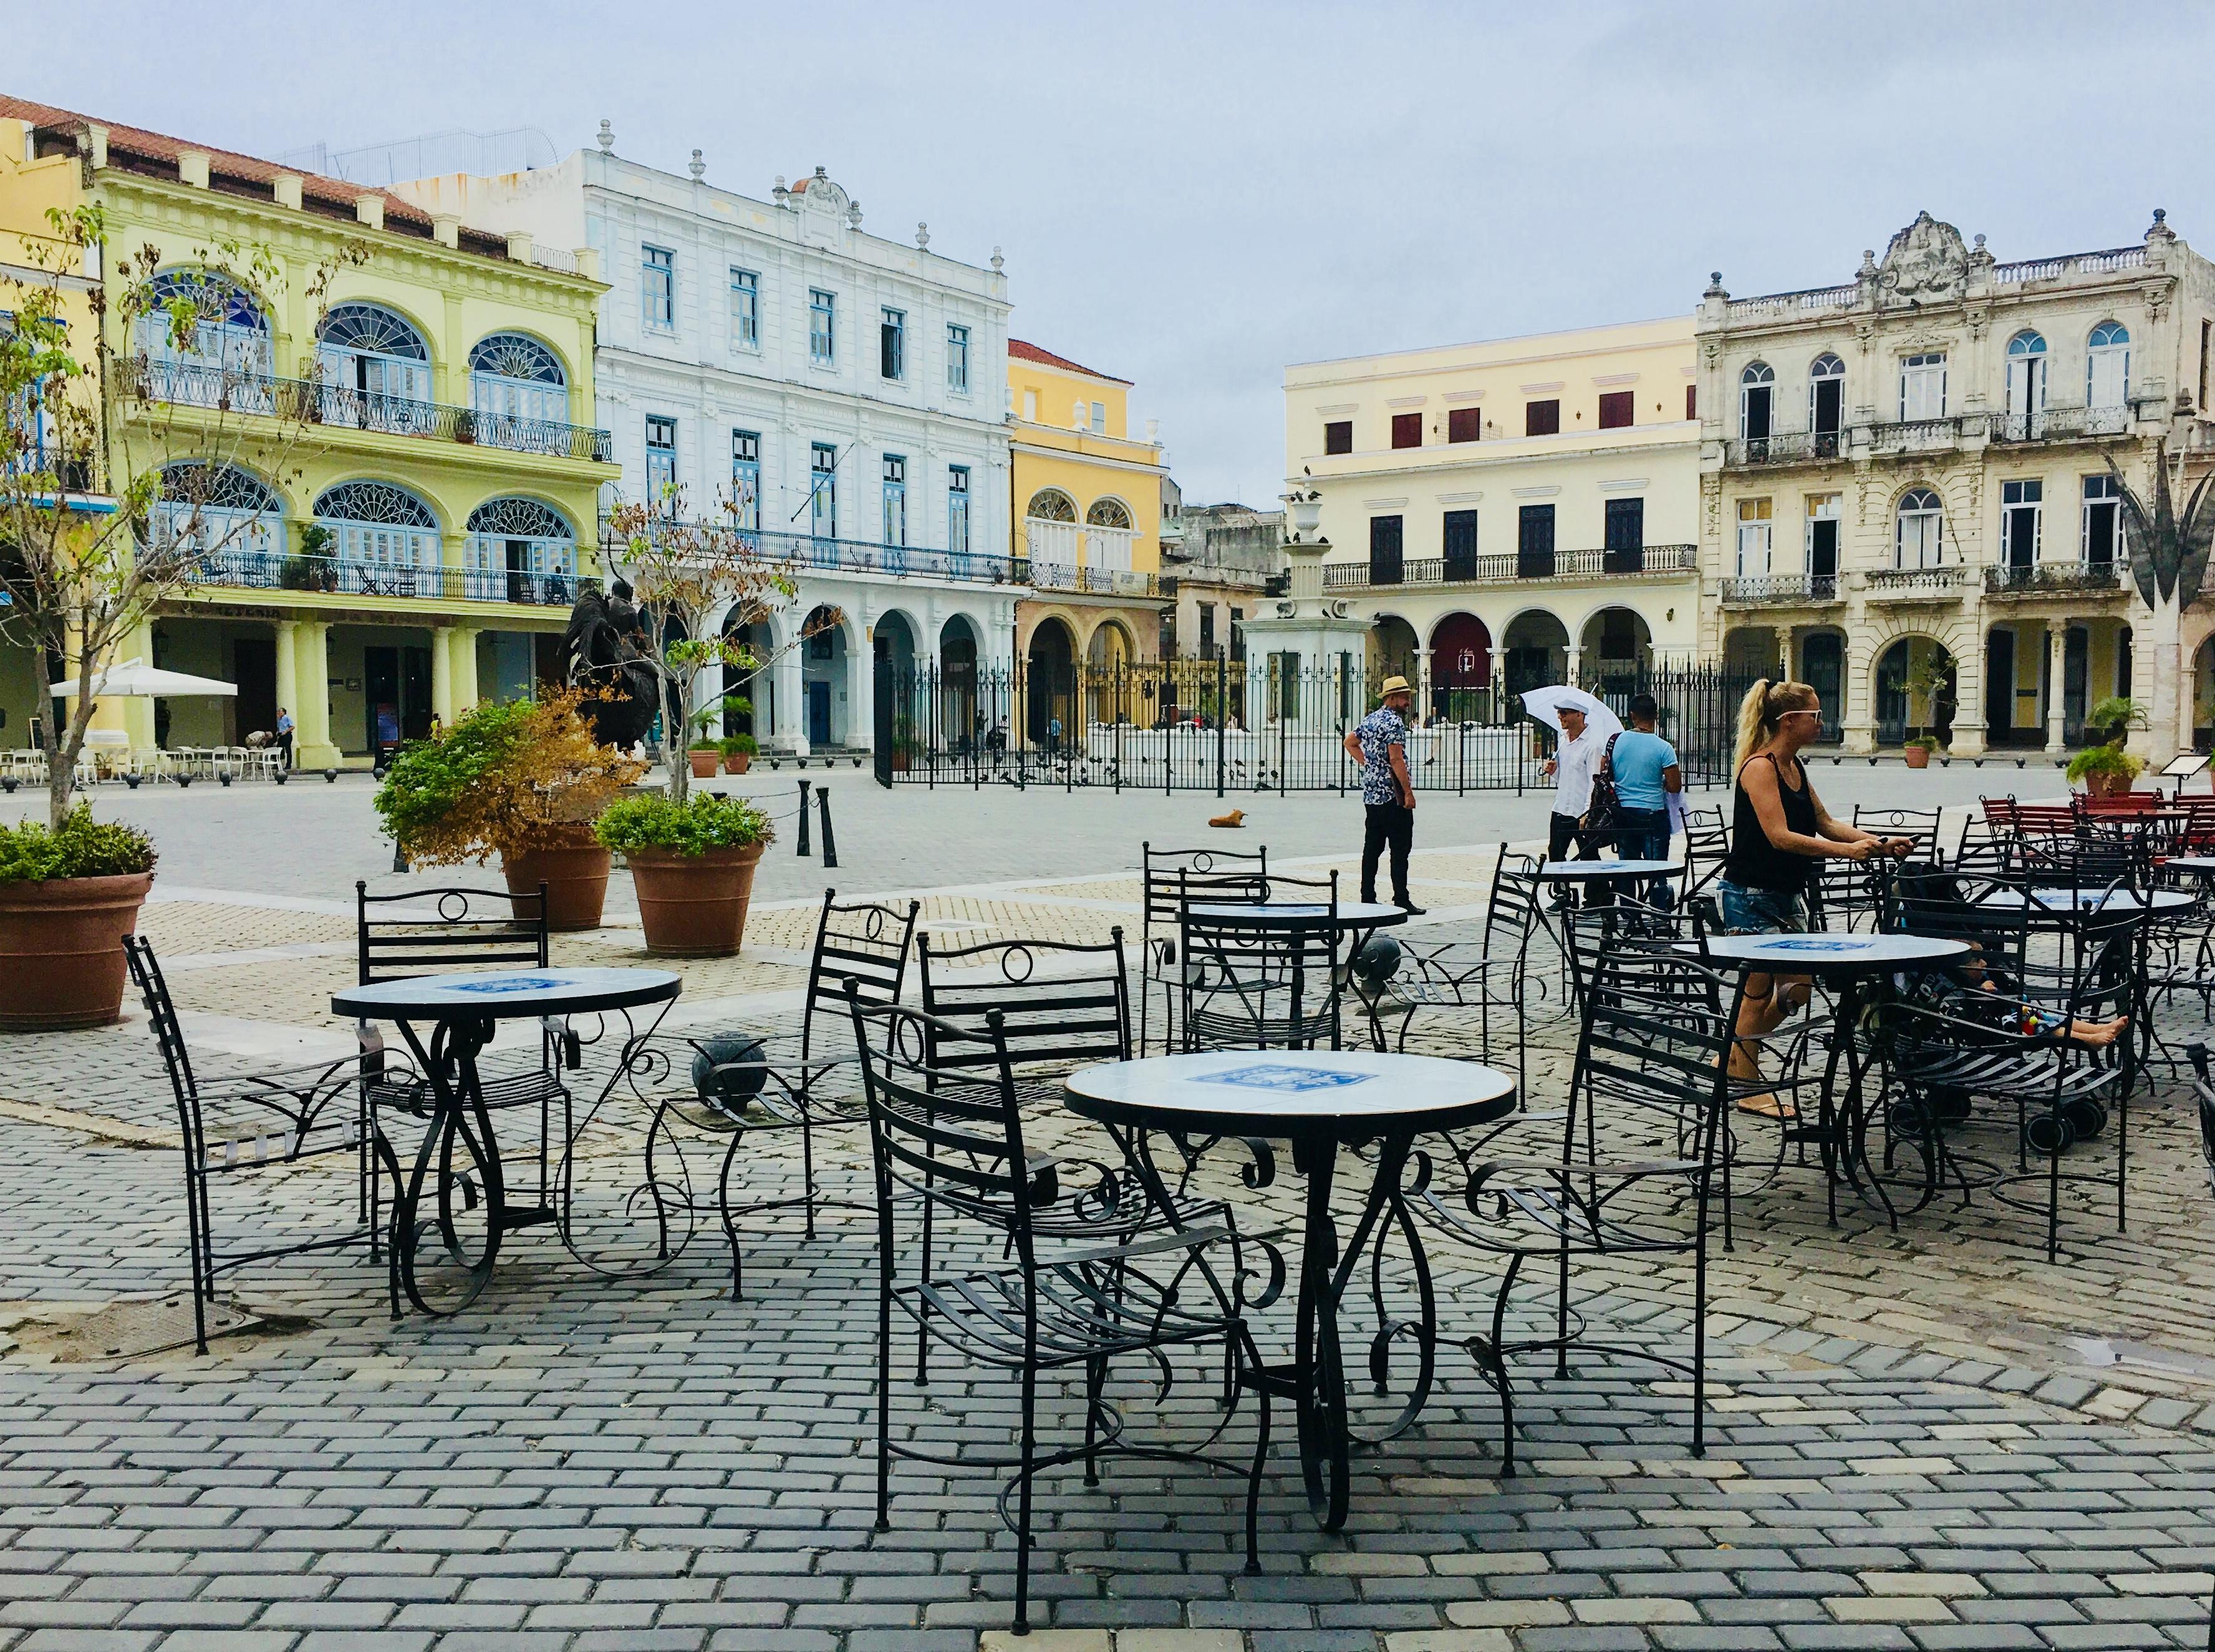 Old Merchants square, Havana Cuba